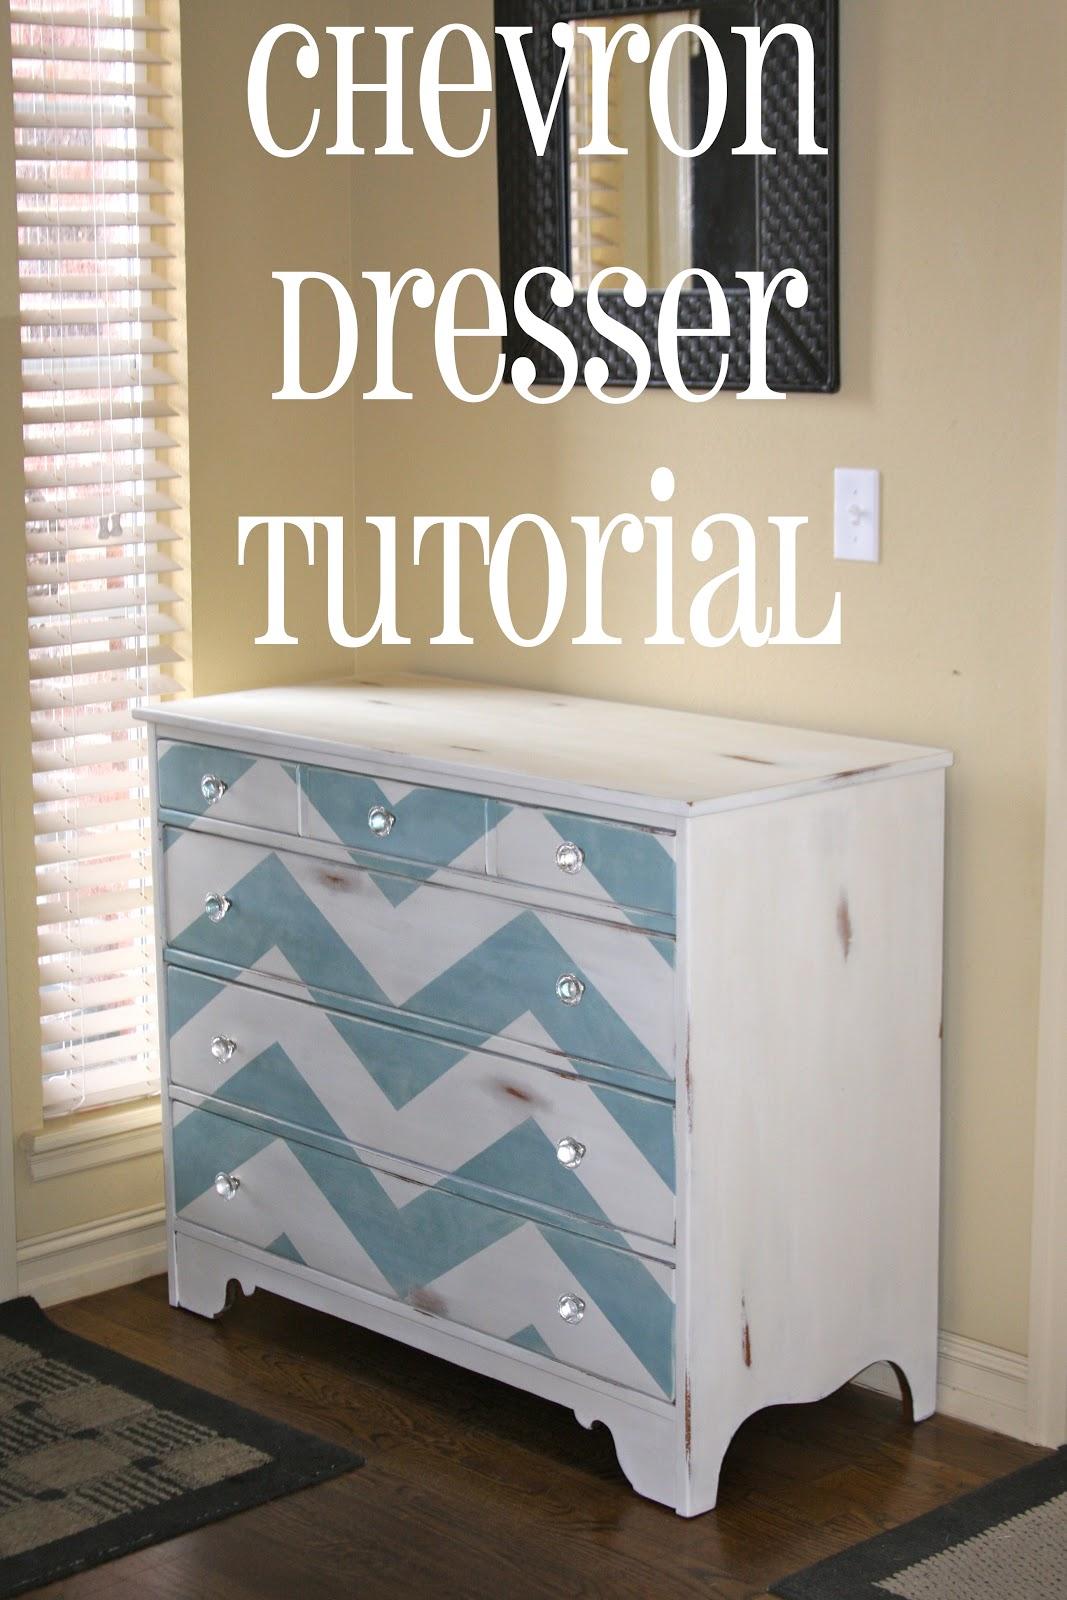 painted chevron dresser tutorial chevron painted furniture